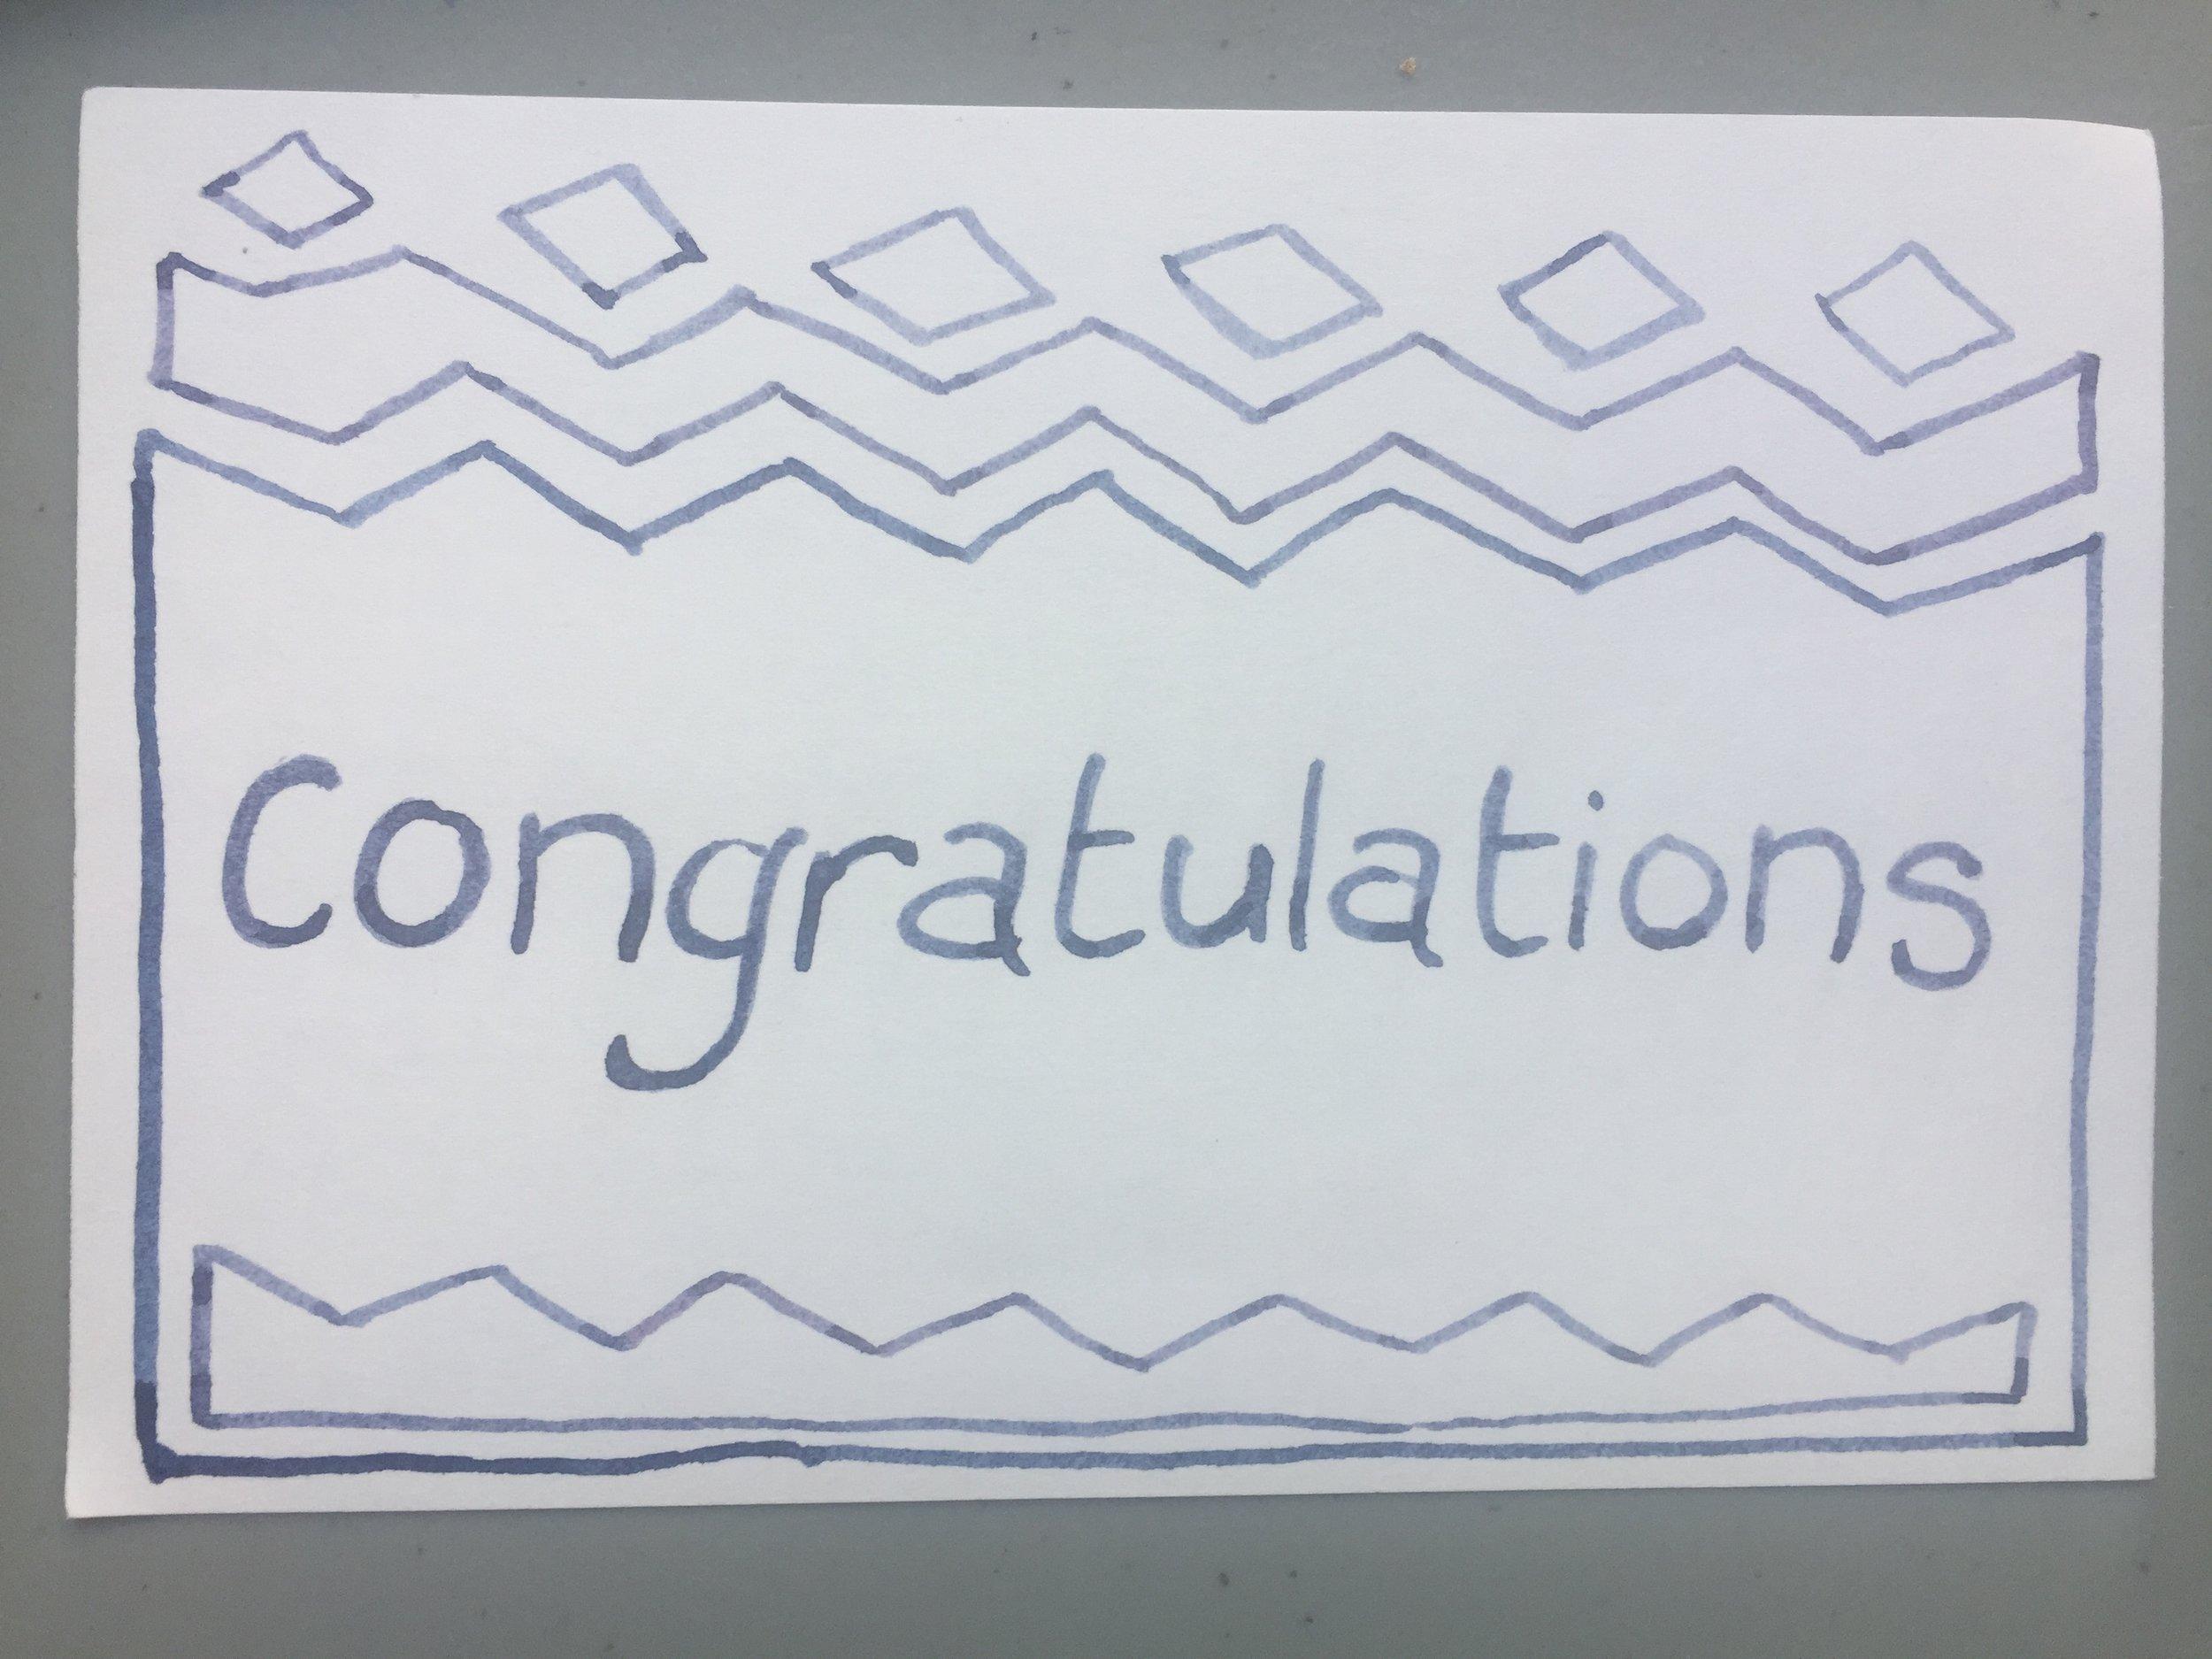 congratulation_line.JPG